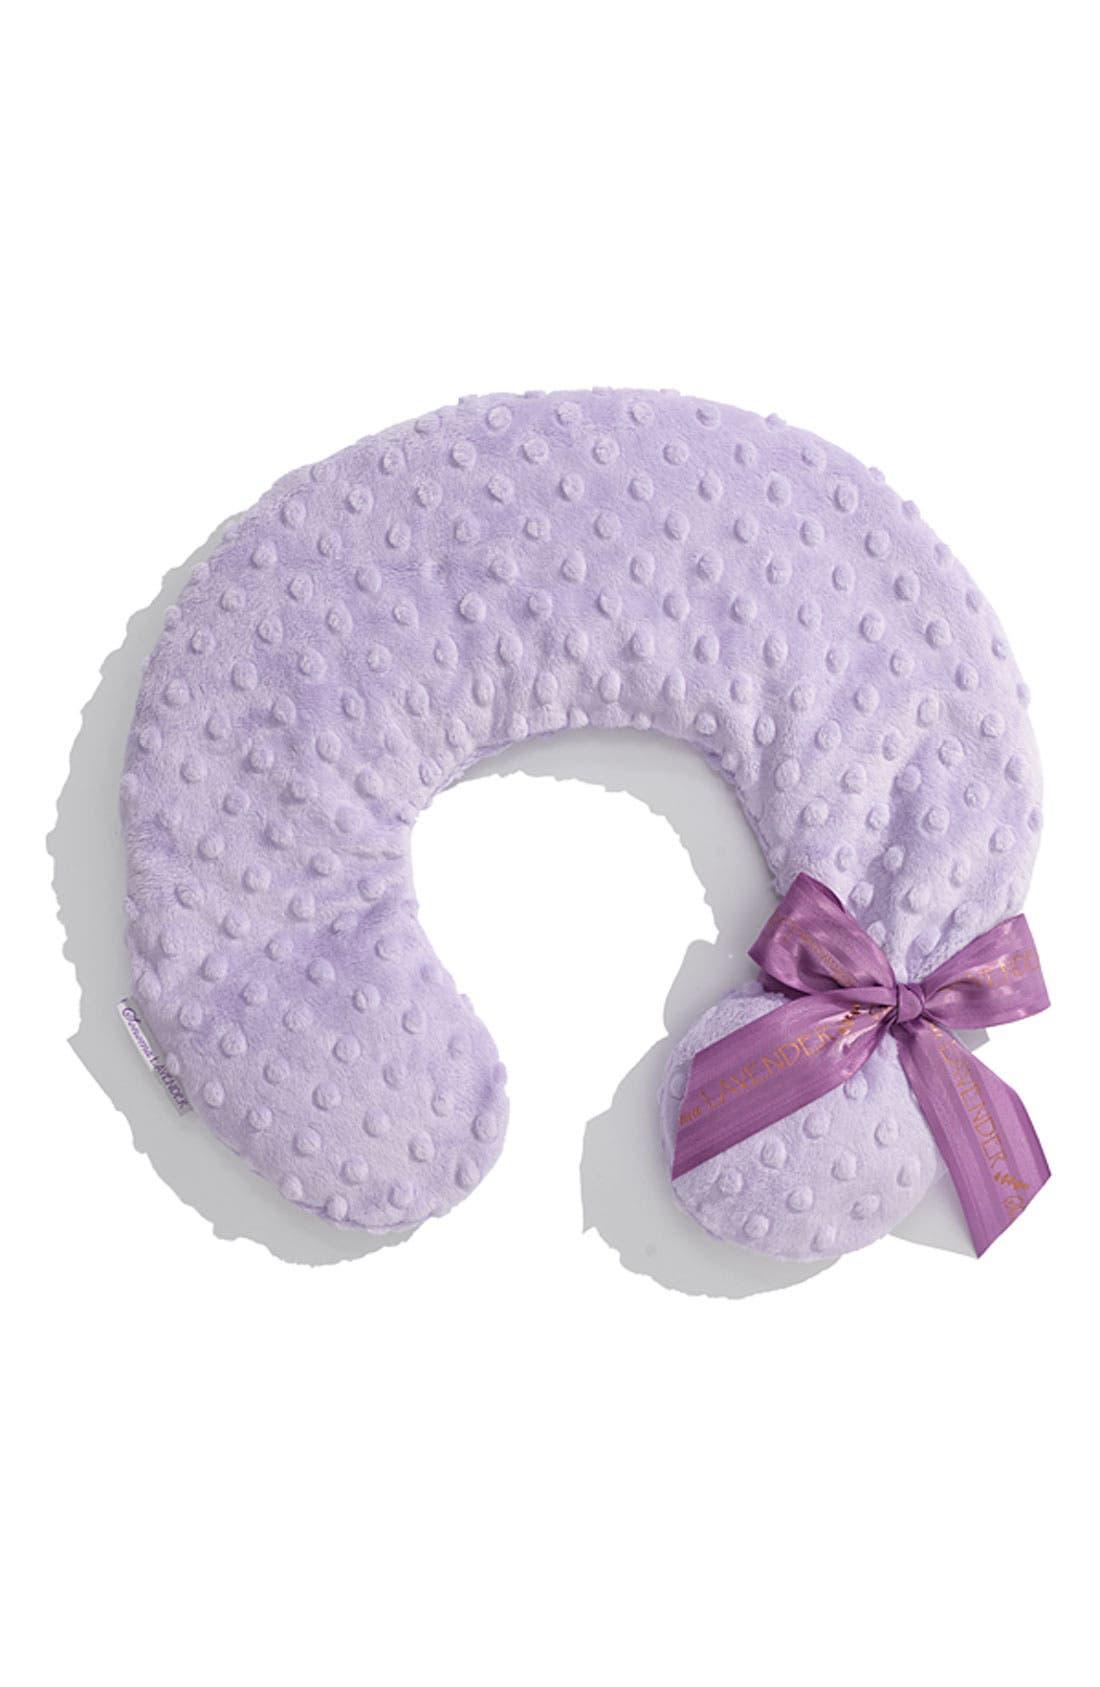 Dot Neck Pillow,                         Main,                         color, 000